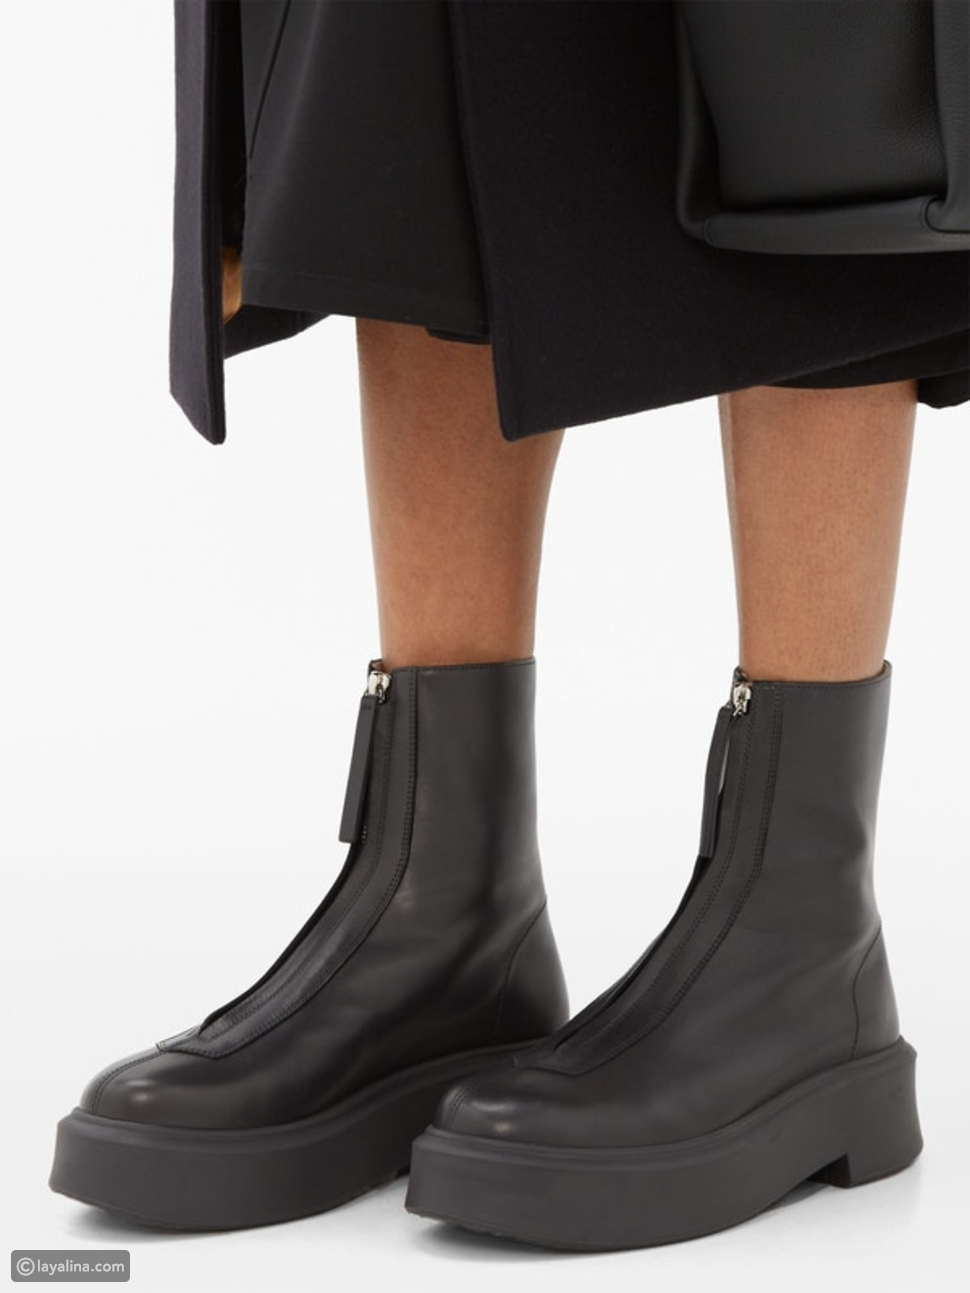 "حذاء ذا رو سحاب 1 من الجلد للكاحل ""The Row Zipped 1 Leather Ankle Boots"""